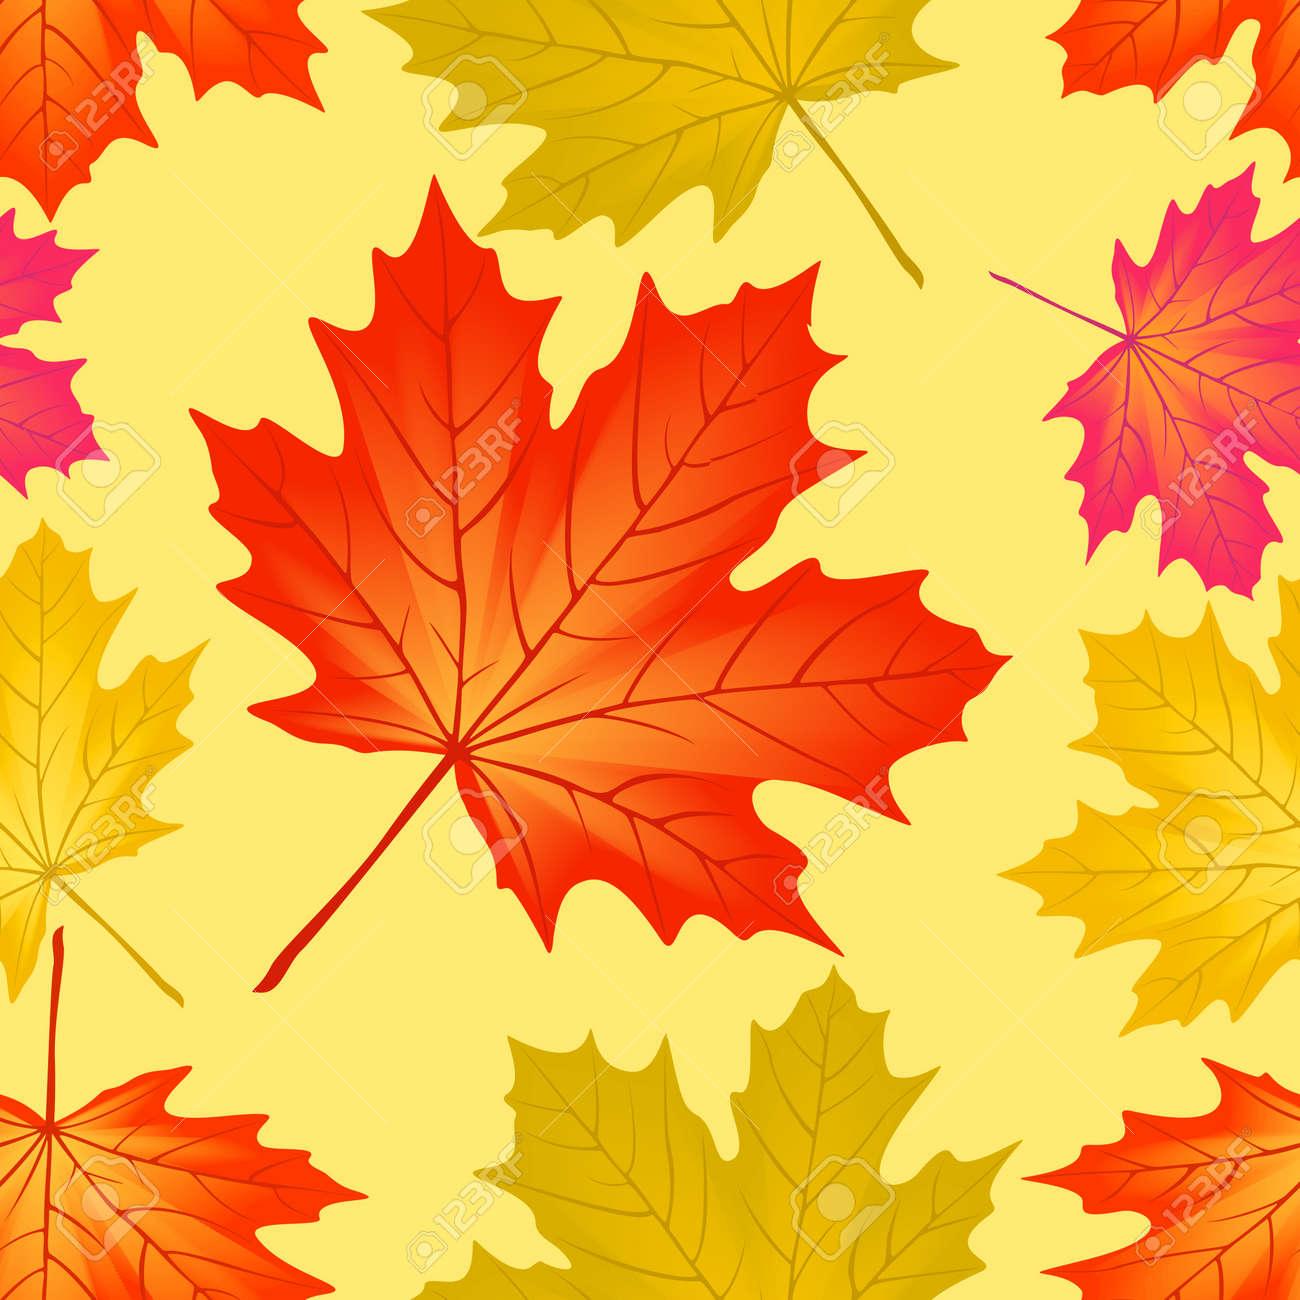 Seamless pattern autumn maple leaves. - 10493896